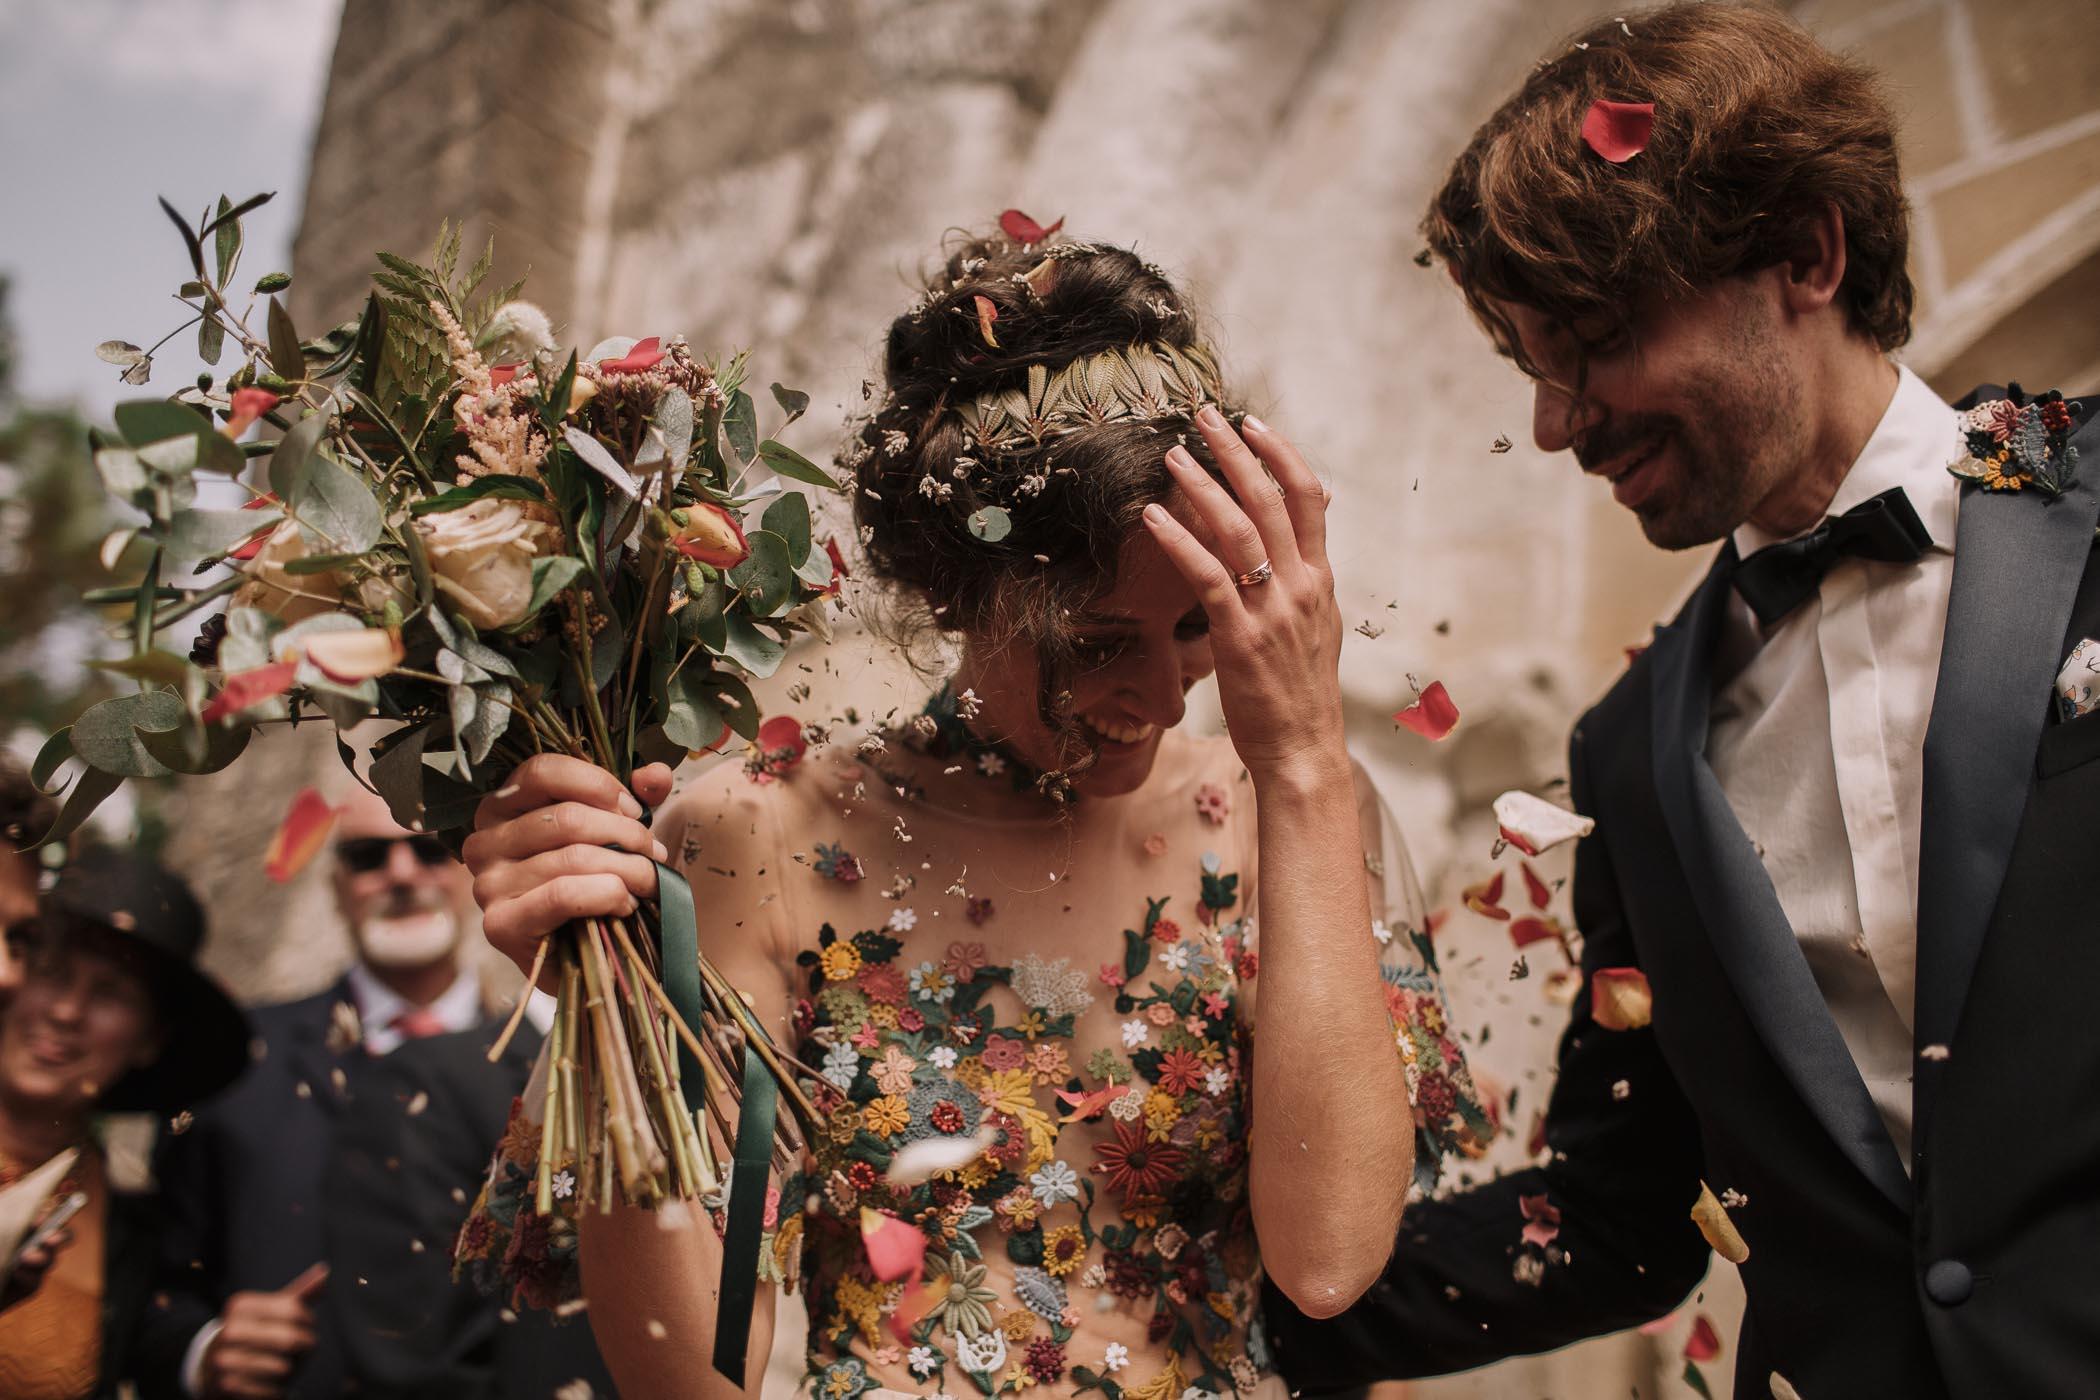 Photographe-mariage-bordeaux-jeremy-boyer-5.jpg